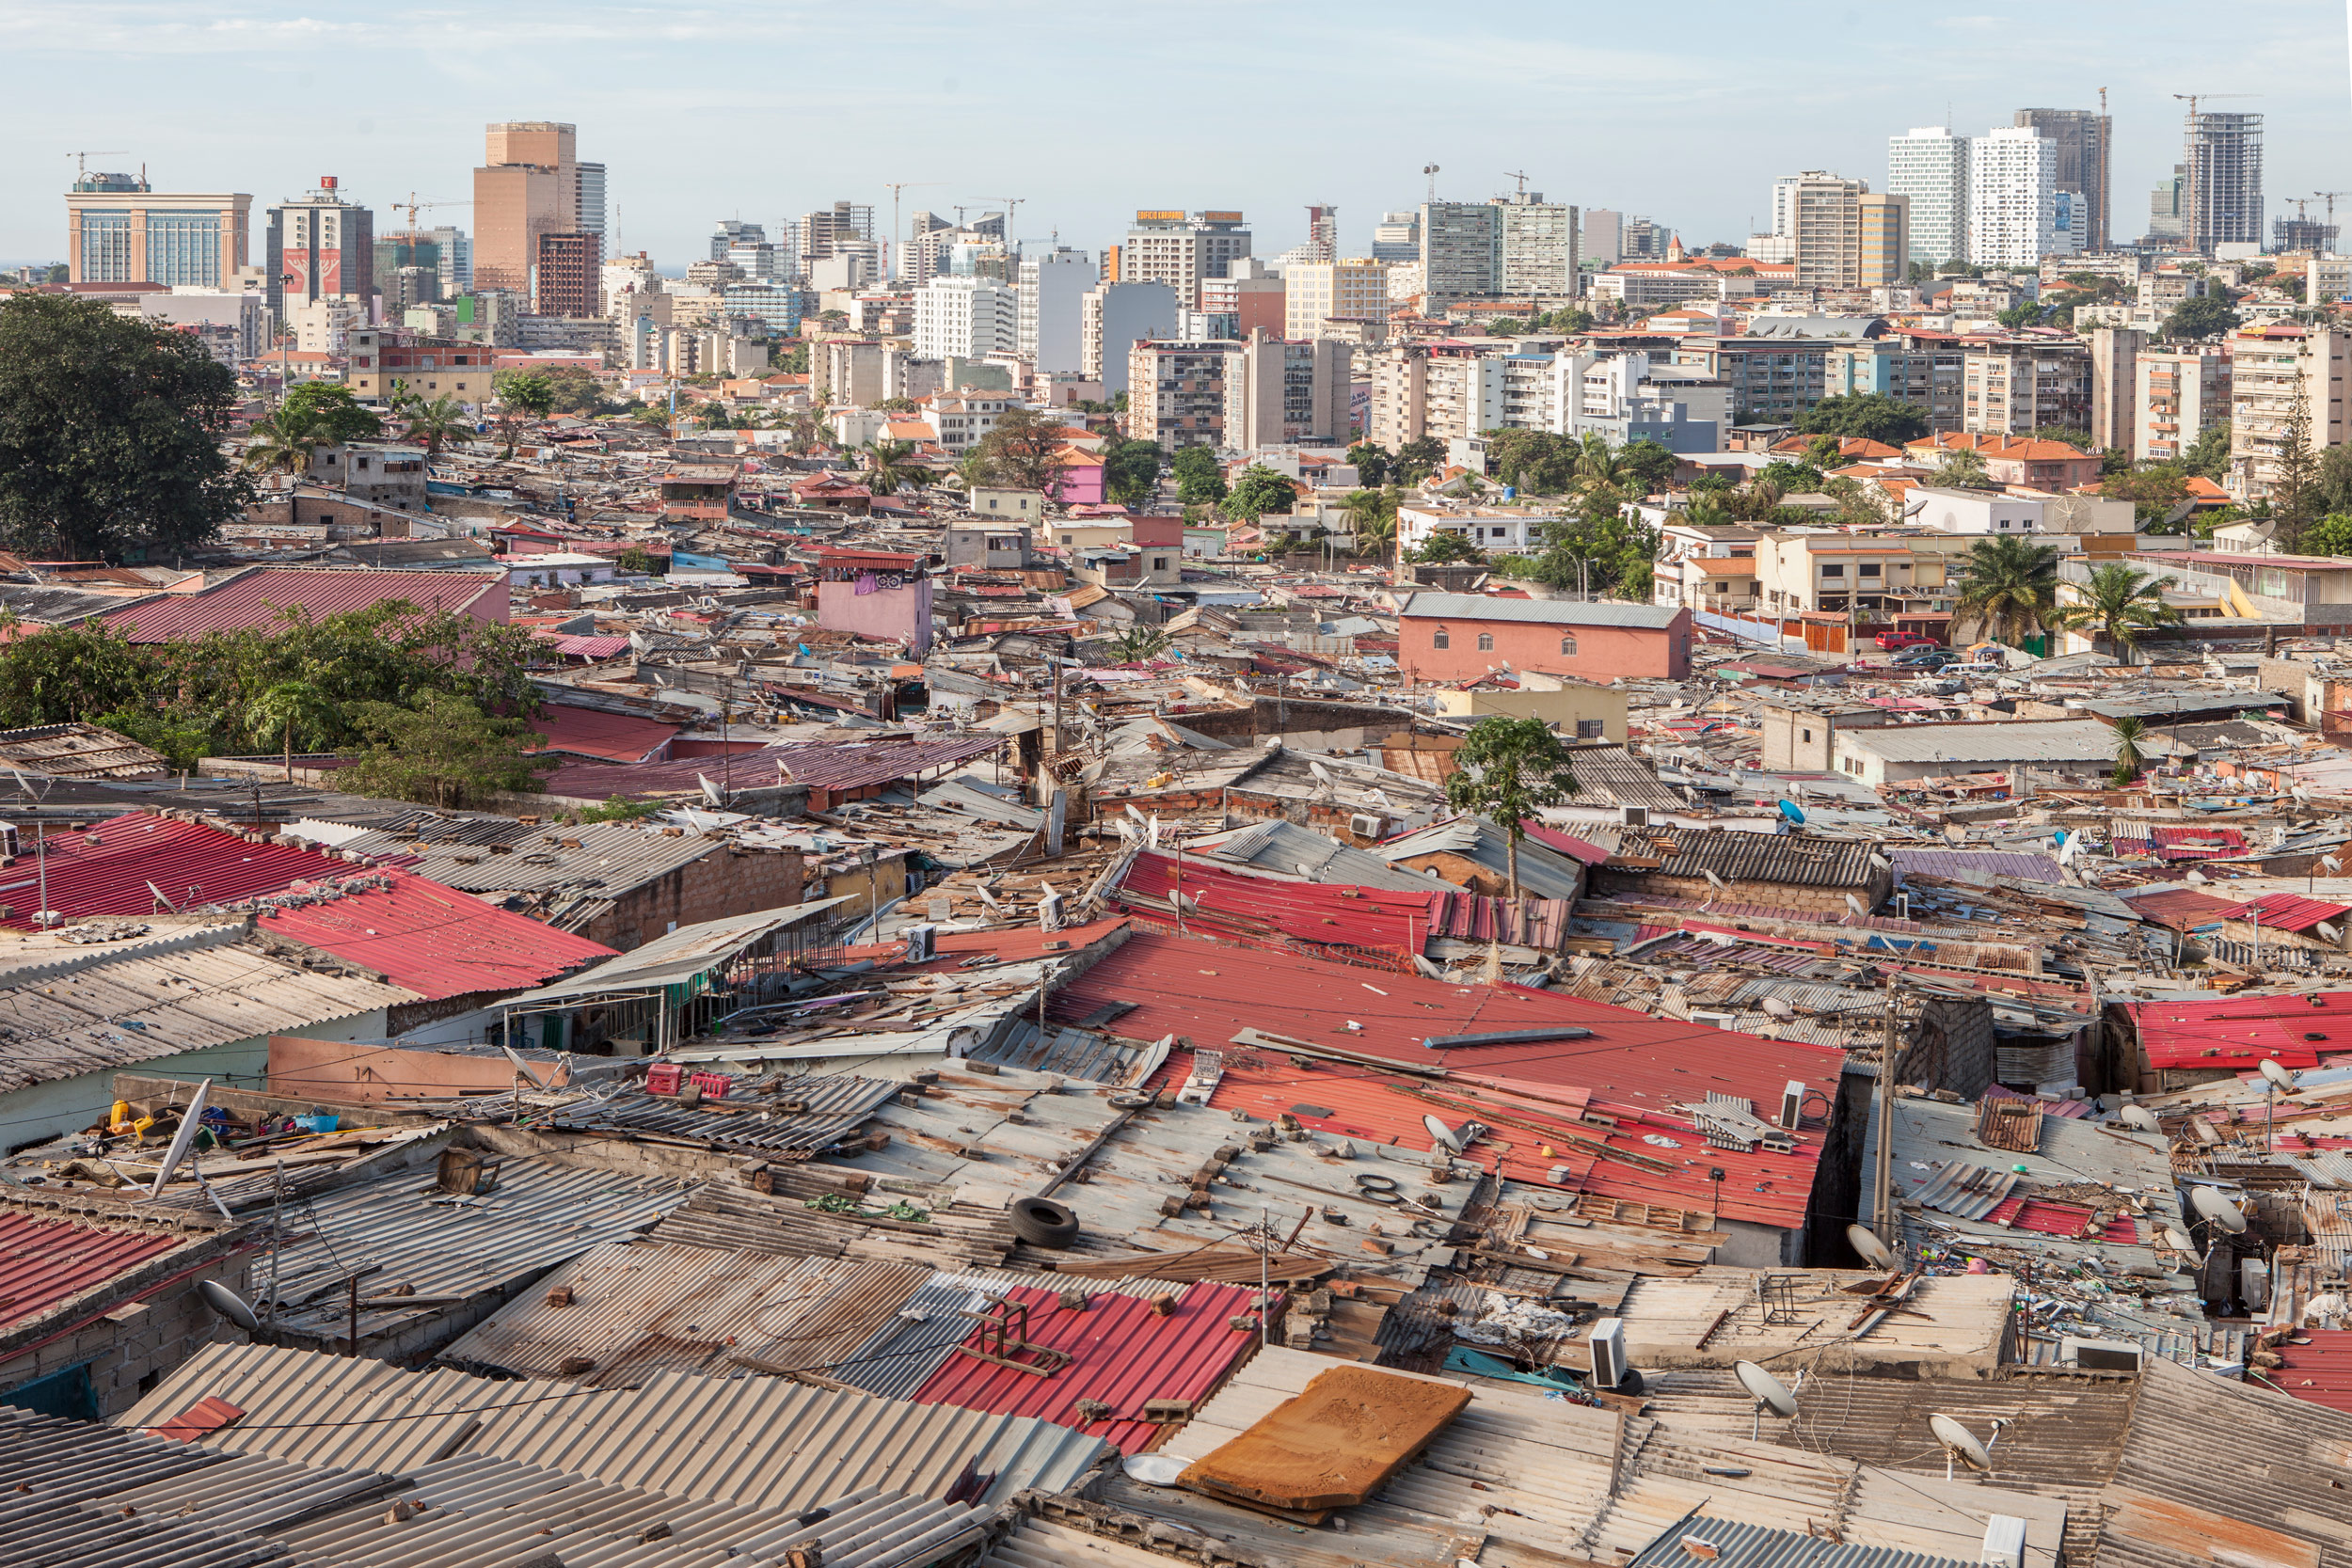 Angola Città e baracche